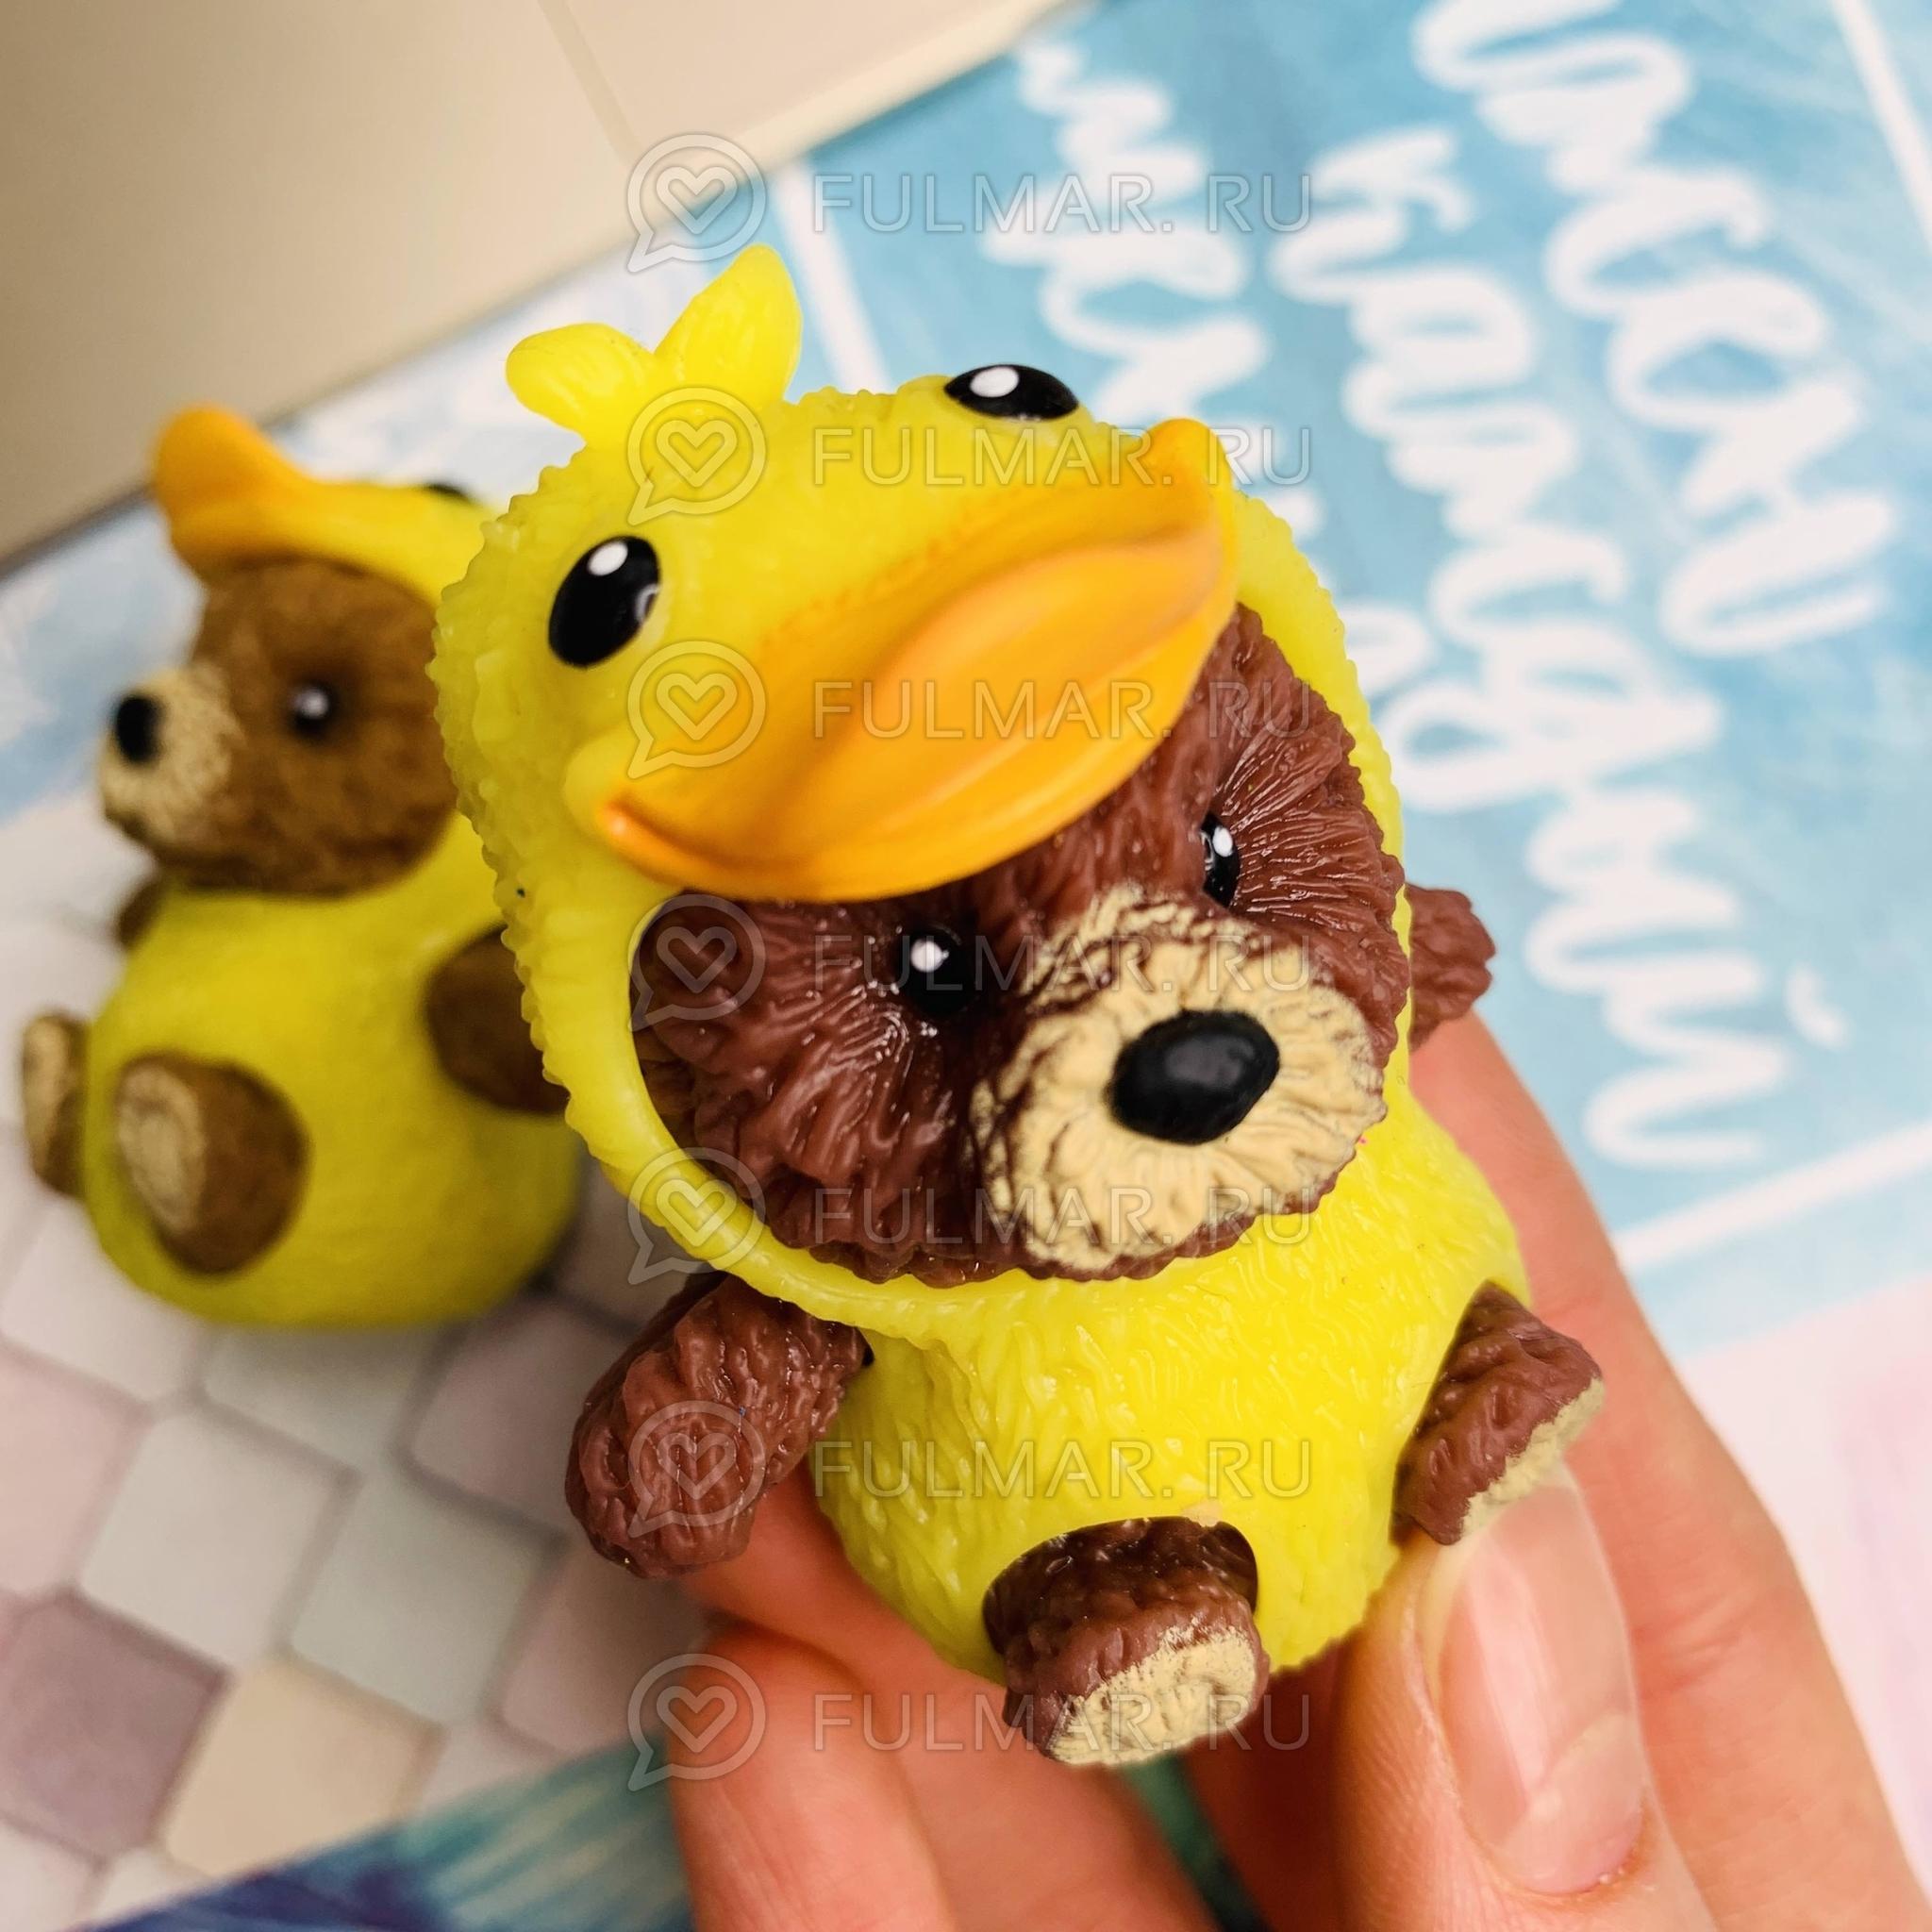 Мишка в костюме Утёнка Игрушка Тянучка антистресс животное babe stretchable alive цвет: коричневый фото